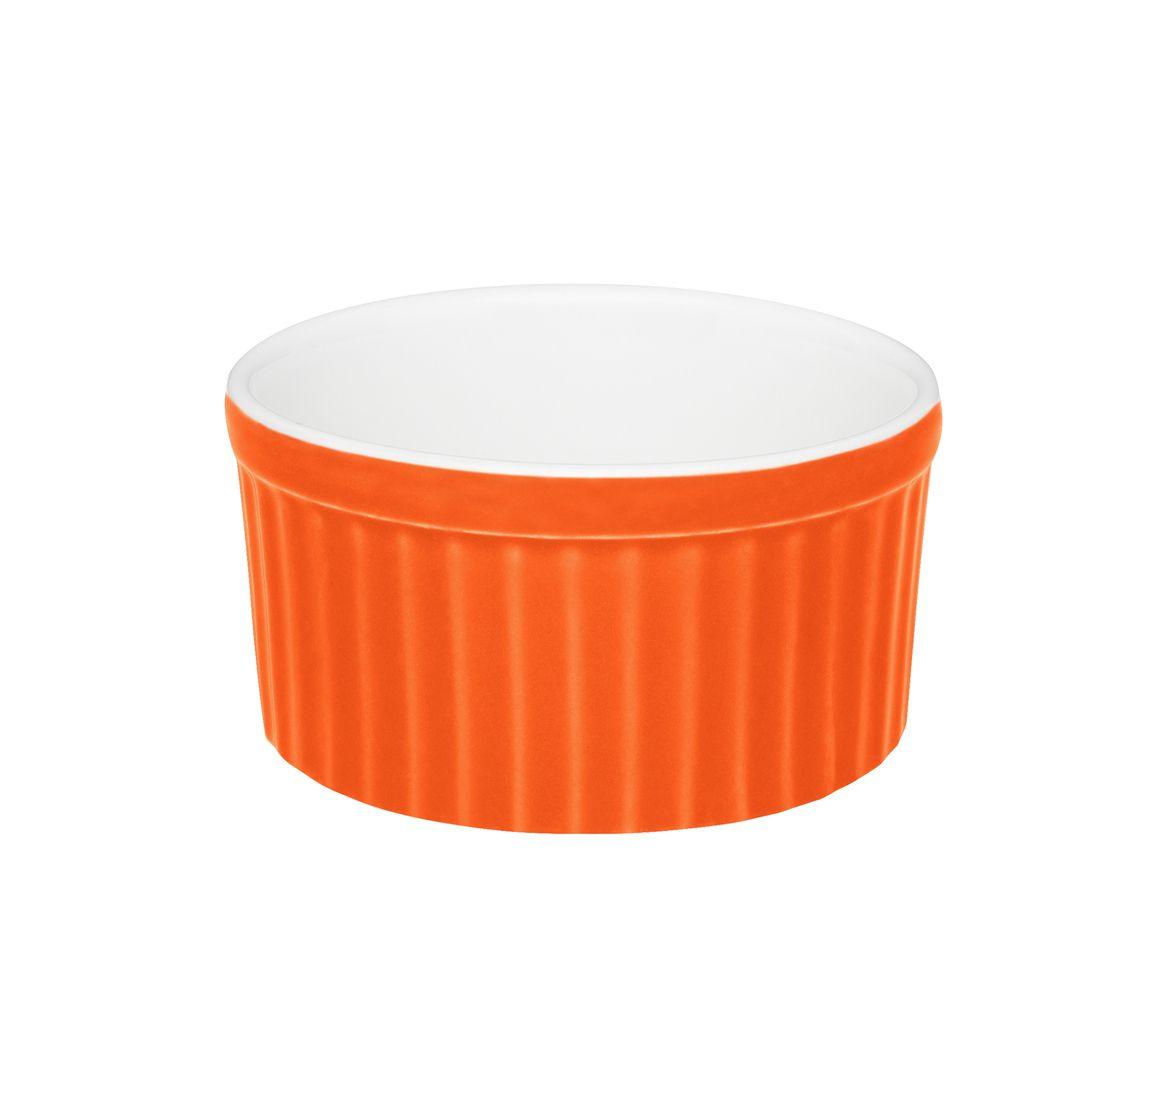 Tigela Ramequin 10X5Cm 180Ml - Branco/Laranja - Oxford Cookware